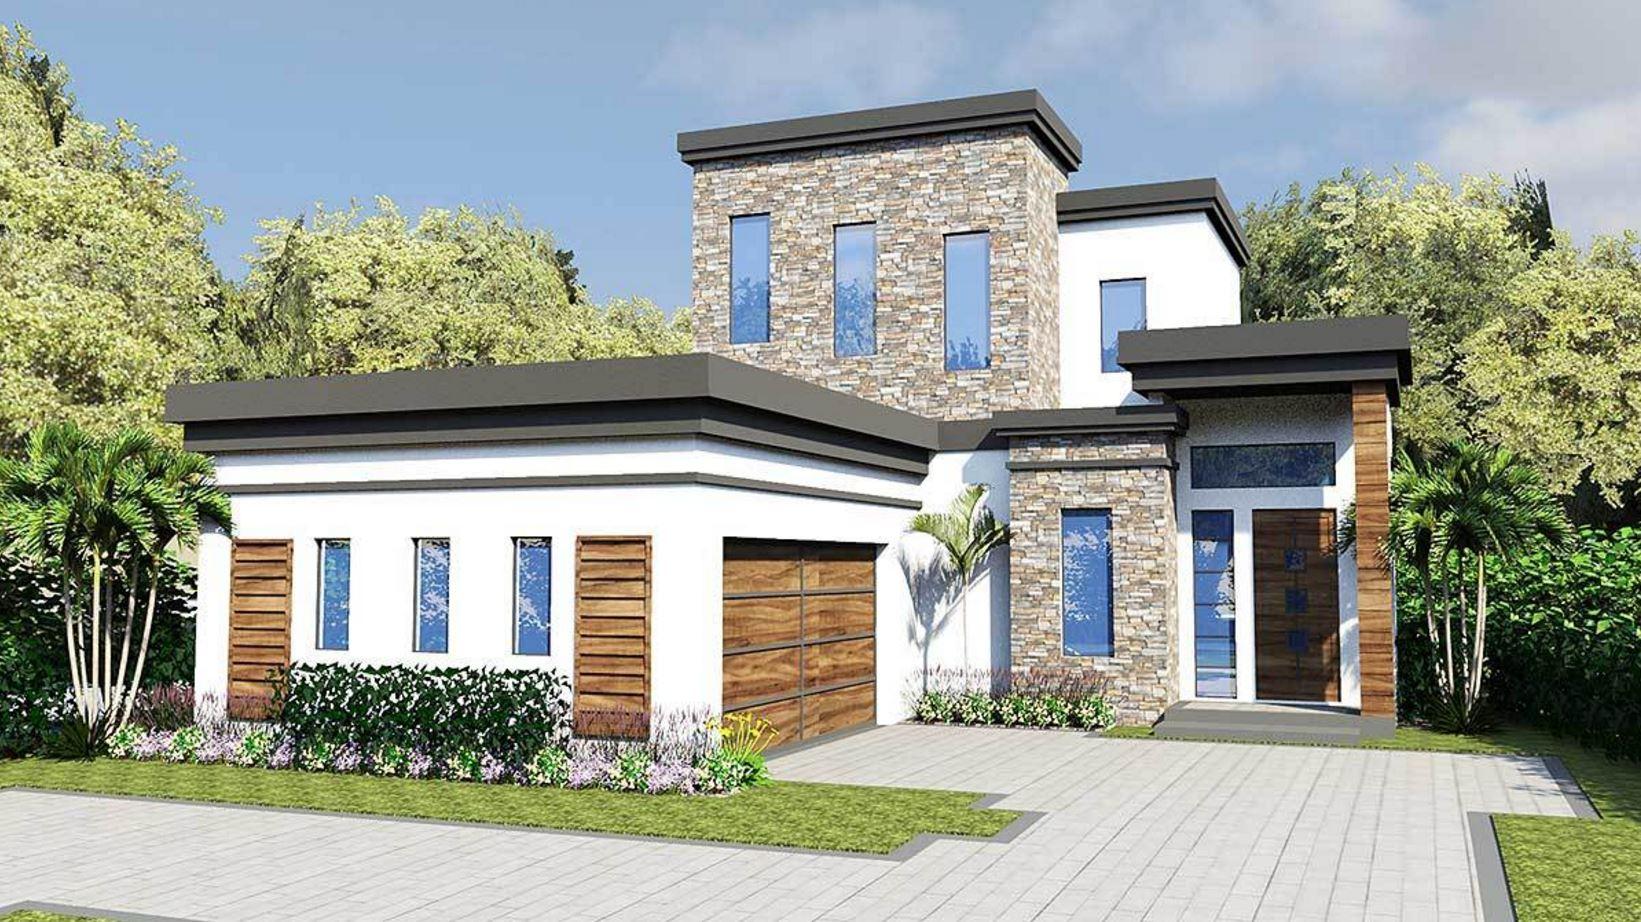 Plano de casa moderna de dos pisos planos de casas modernas for Casas modernas 3 recamaras